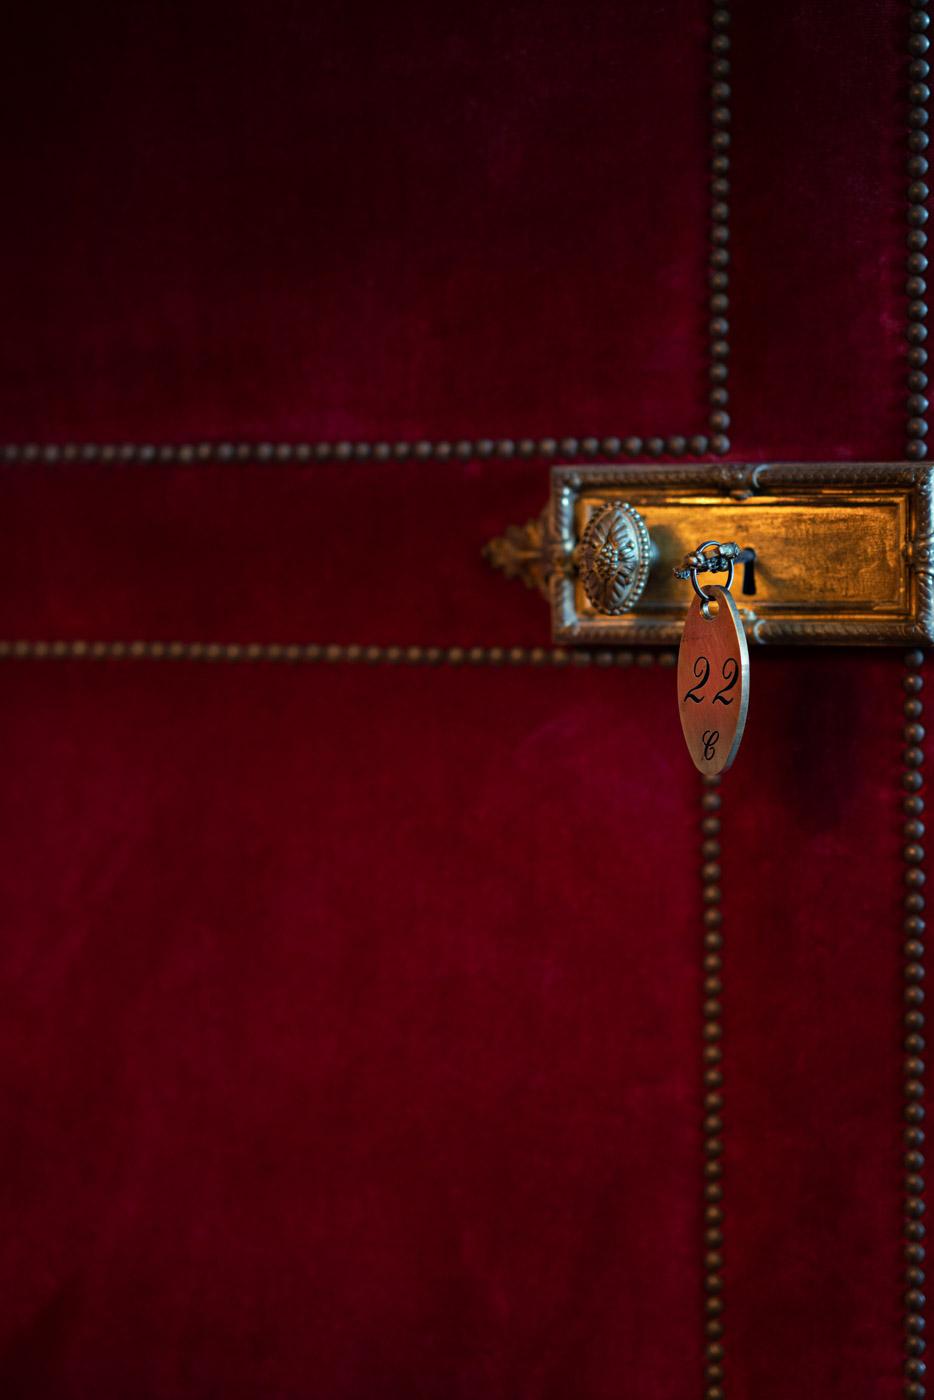 Red velvet door at Villa Astor, Sorrento, Italy - photo by Adagion Studio